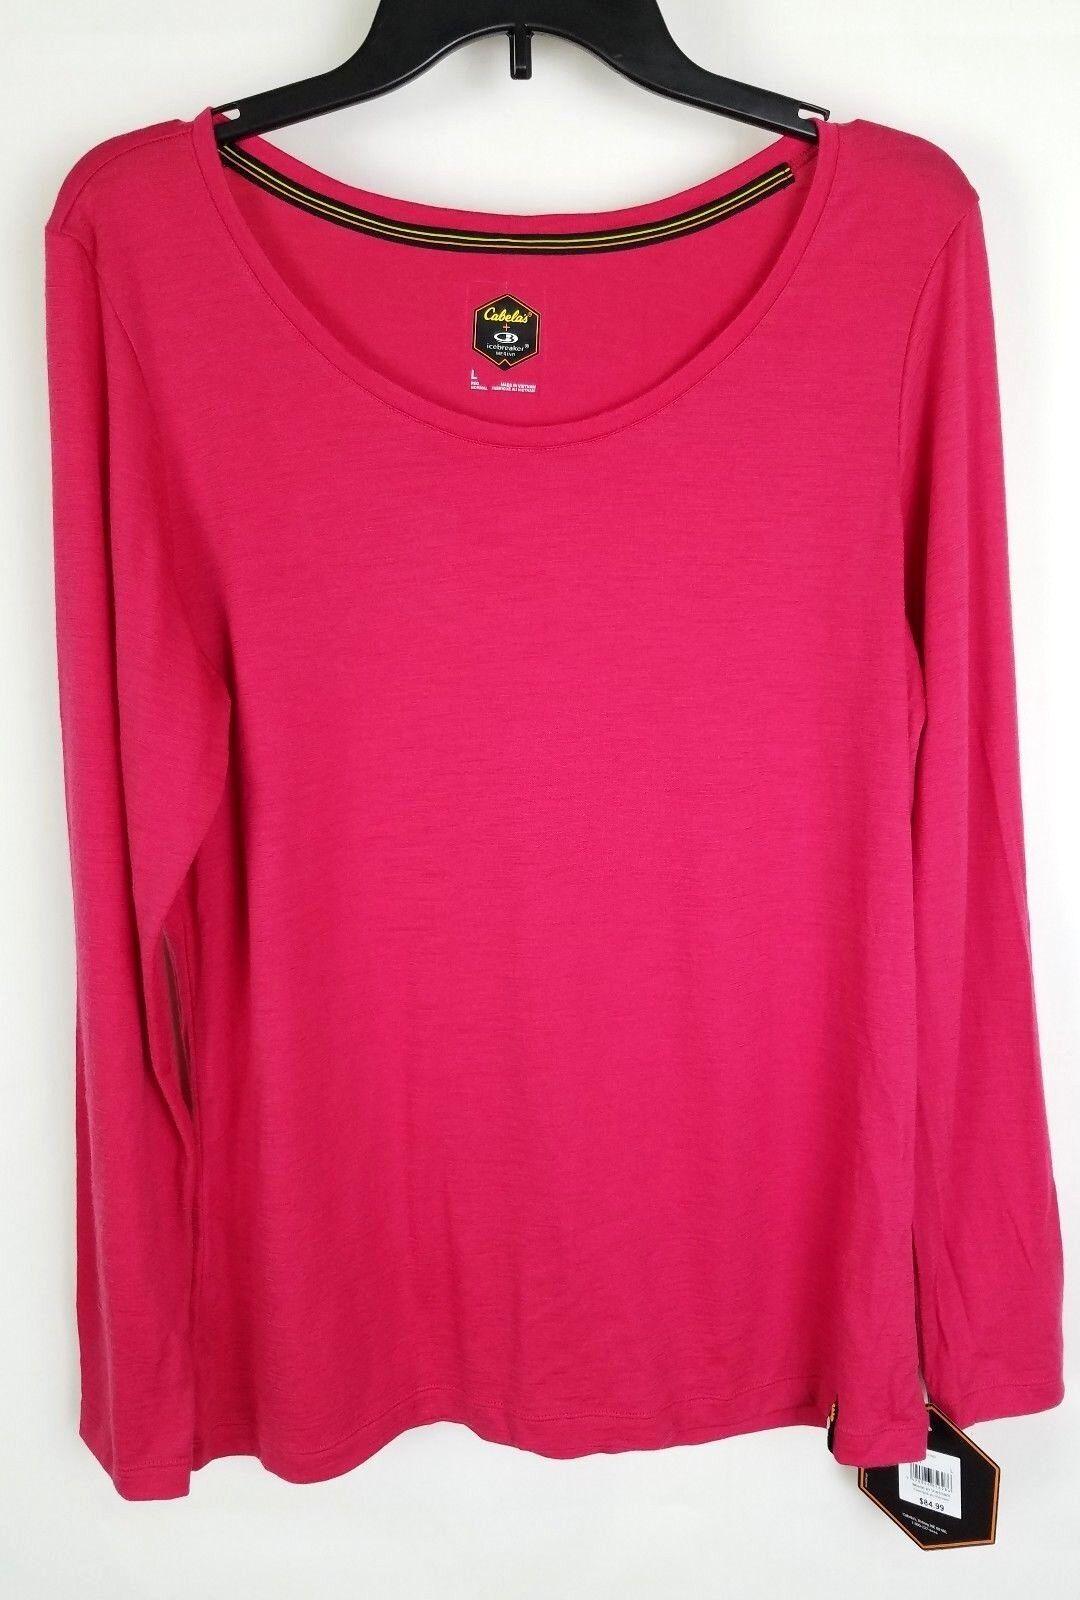 Cabela's  Icebreaker Wouomo L Merino Wool Long Sleeve Scoop Shirt Top Cherub